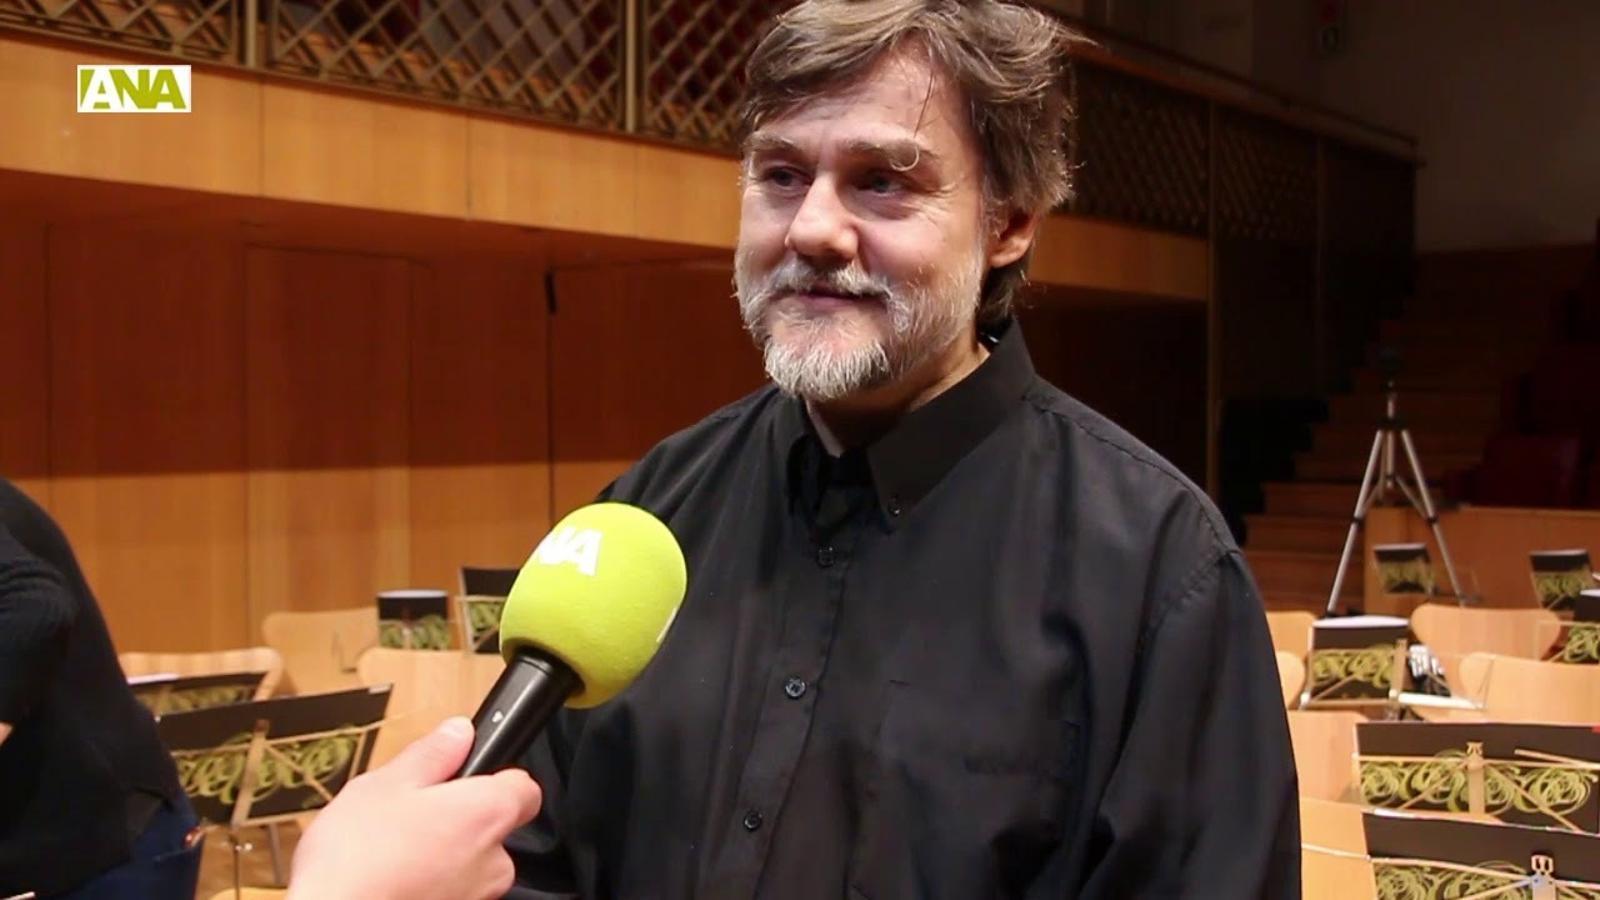 Ple en el concert de Santa Cecília per celebrar el 25è aniversari de l'ONCA